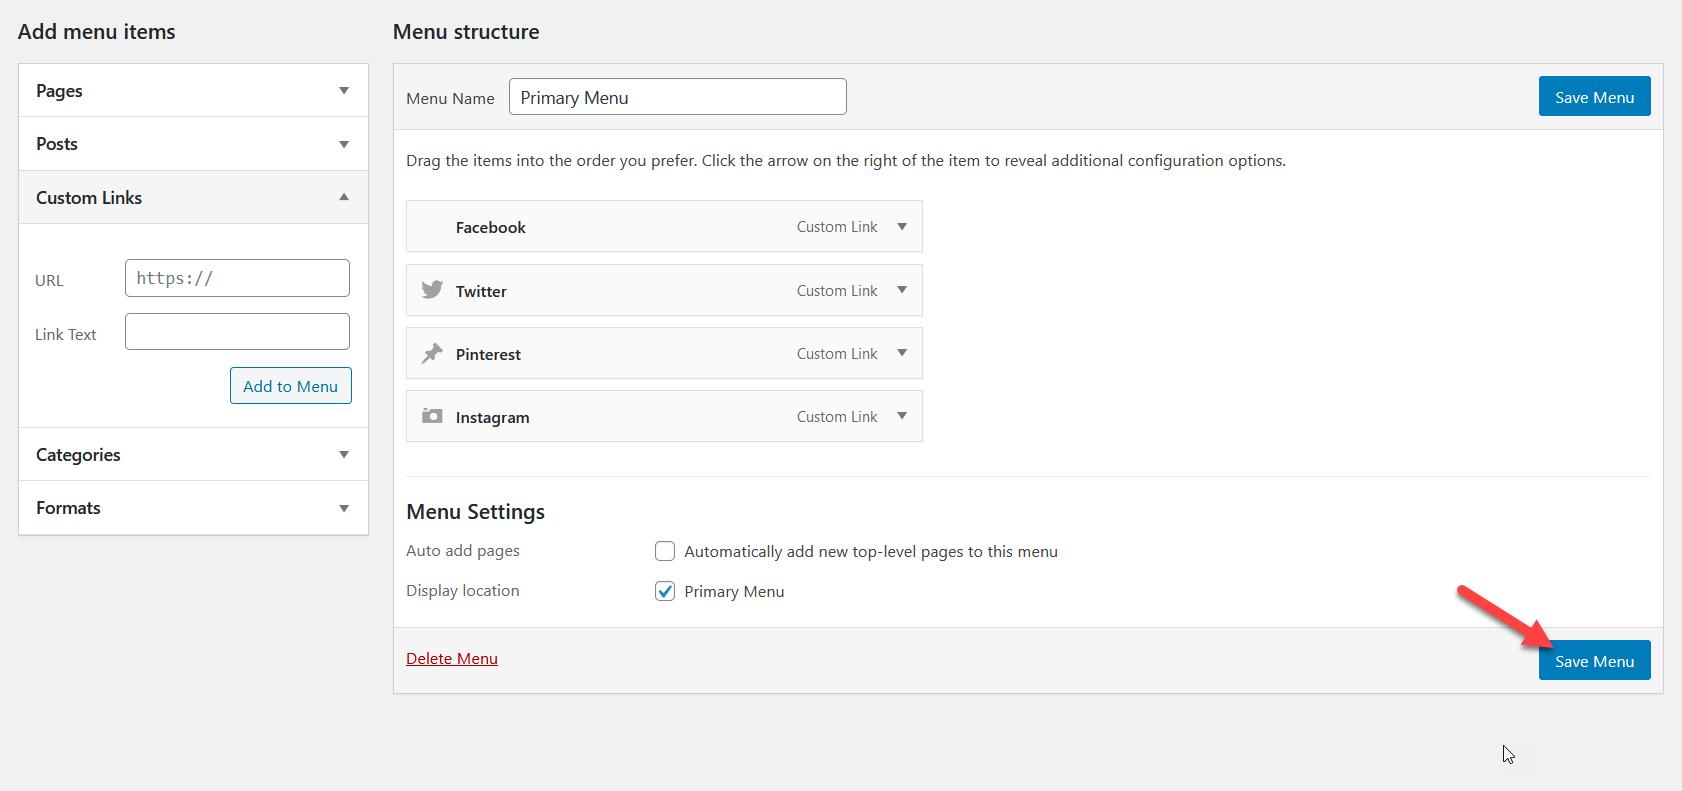 Add Social Media Icons to WordPress Menu - WP menu icons Save menu